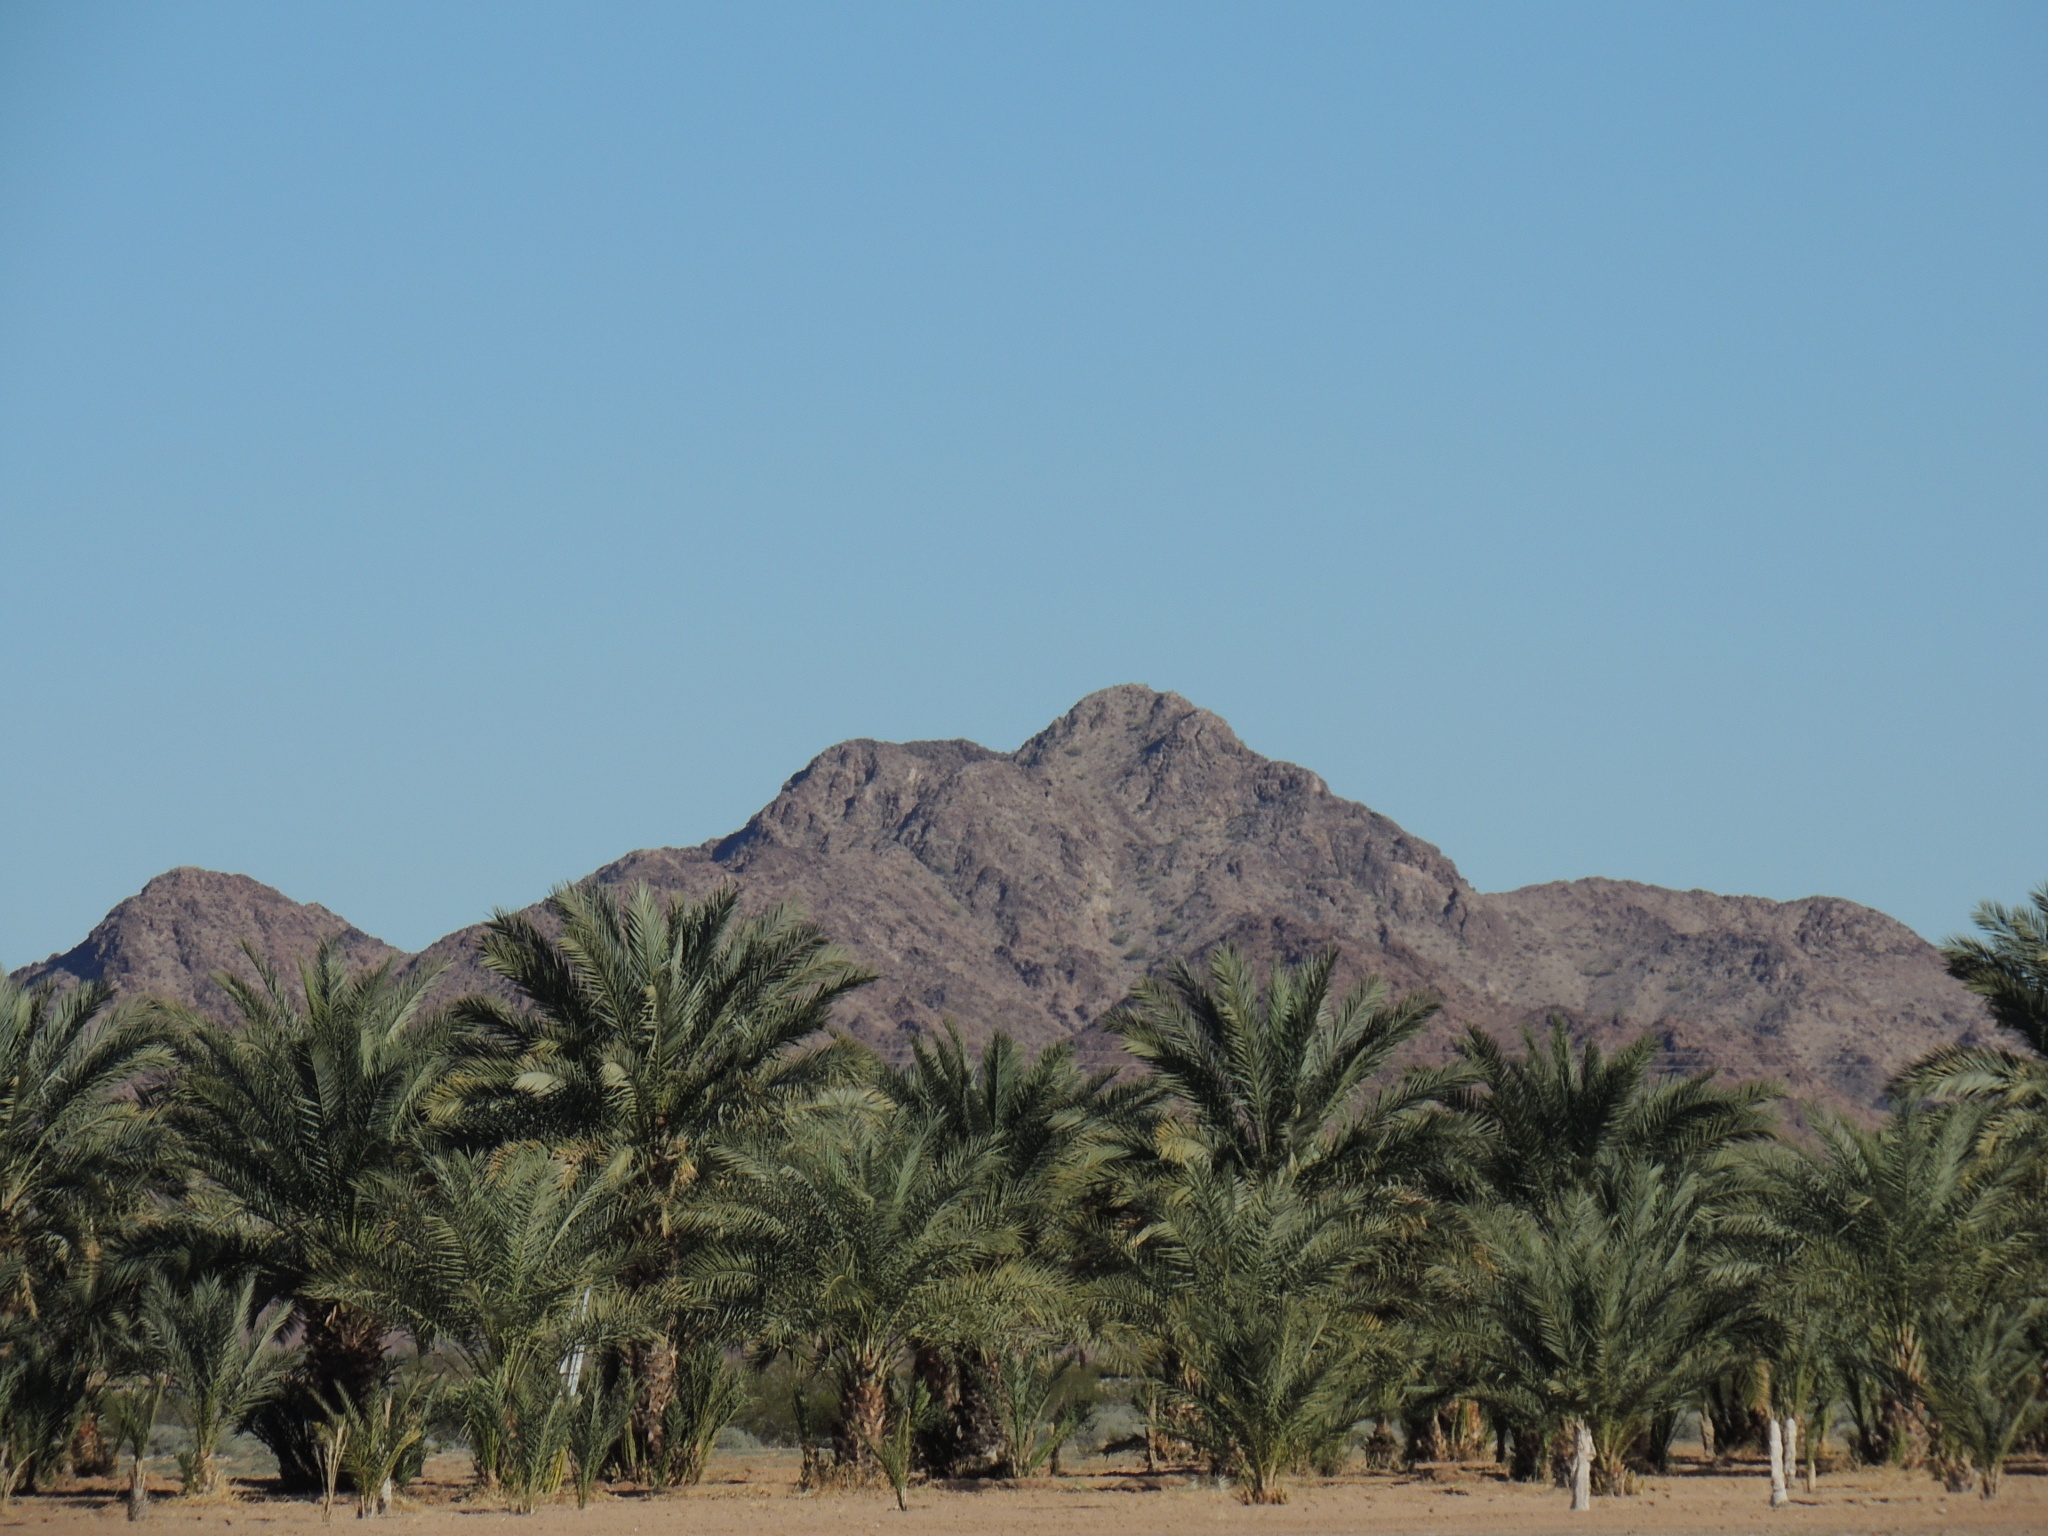 Arizona date farm by sh2020